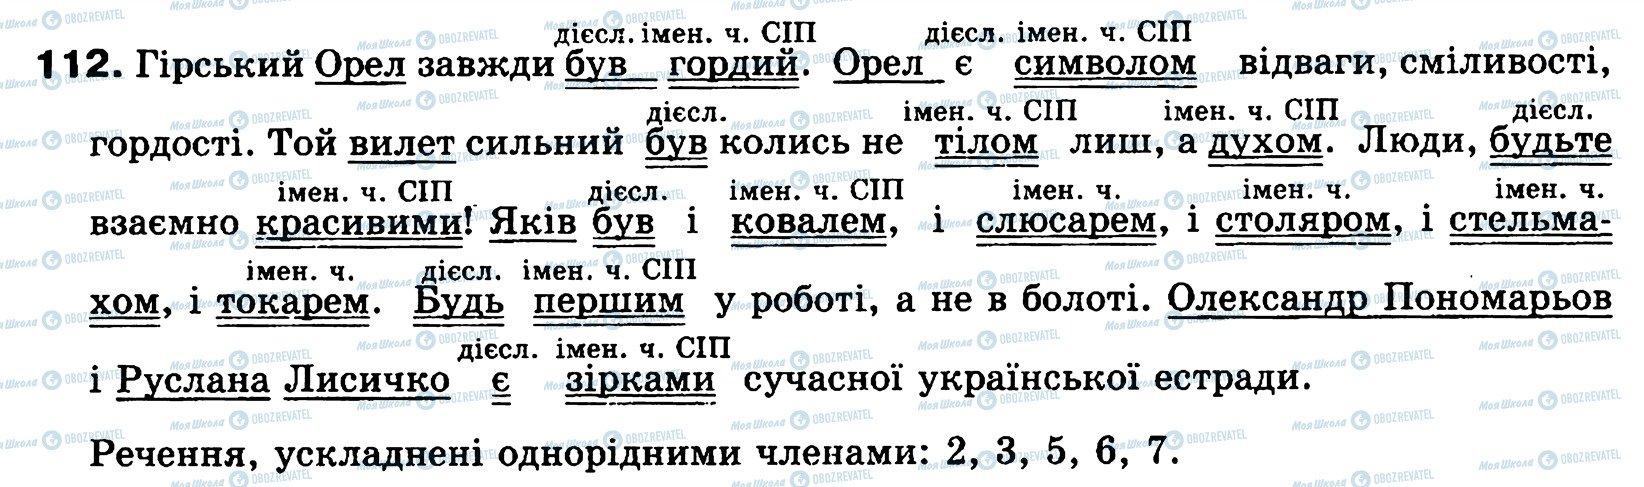 ГДЗ Укр мова 8 класс страница 112